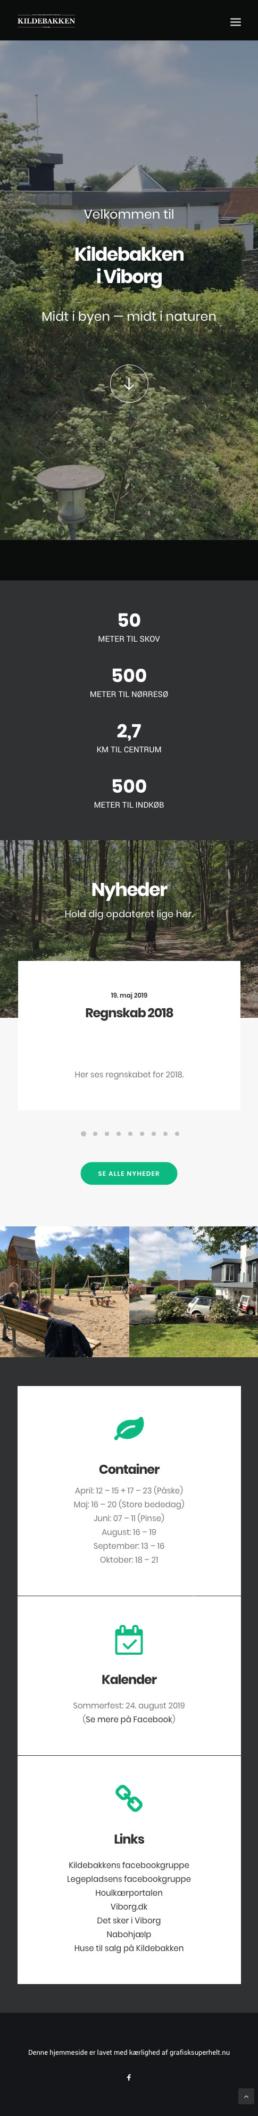 kildebakkenviborg.dk mobile version